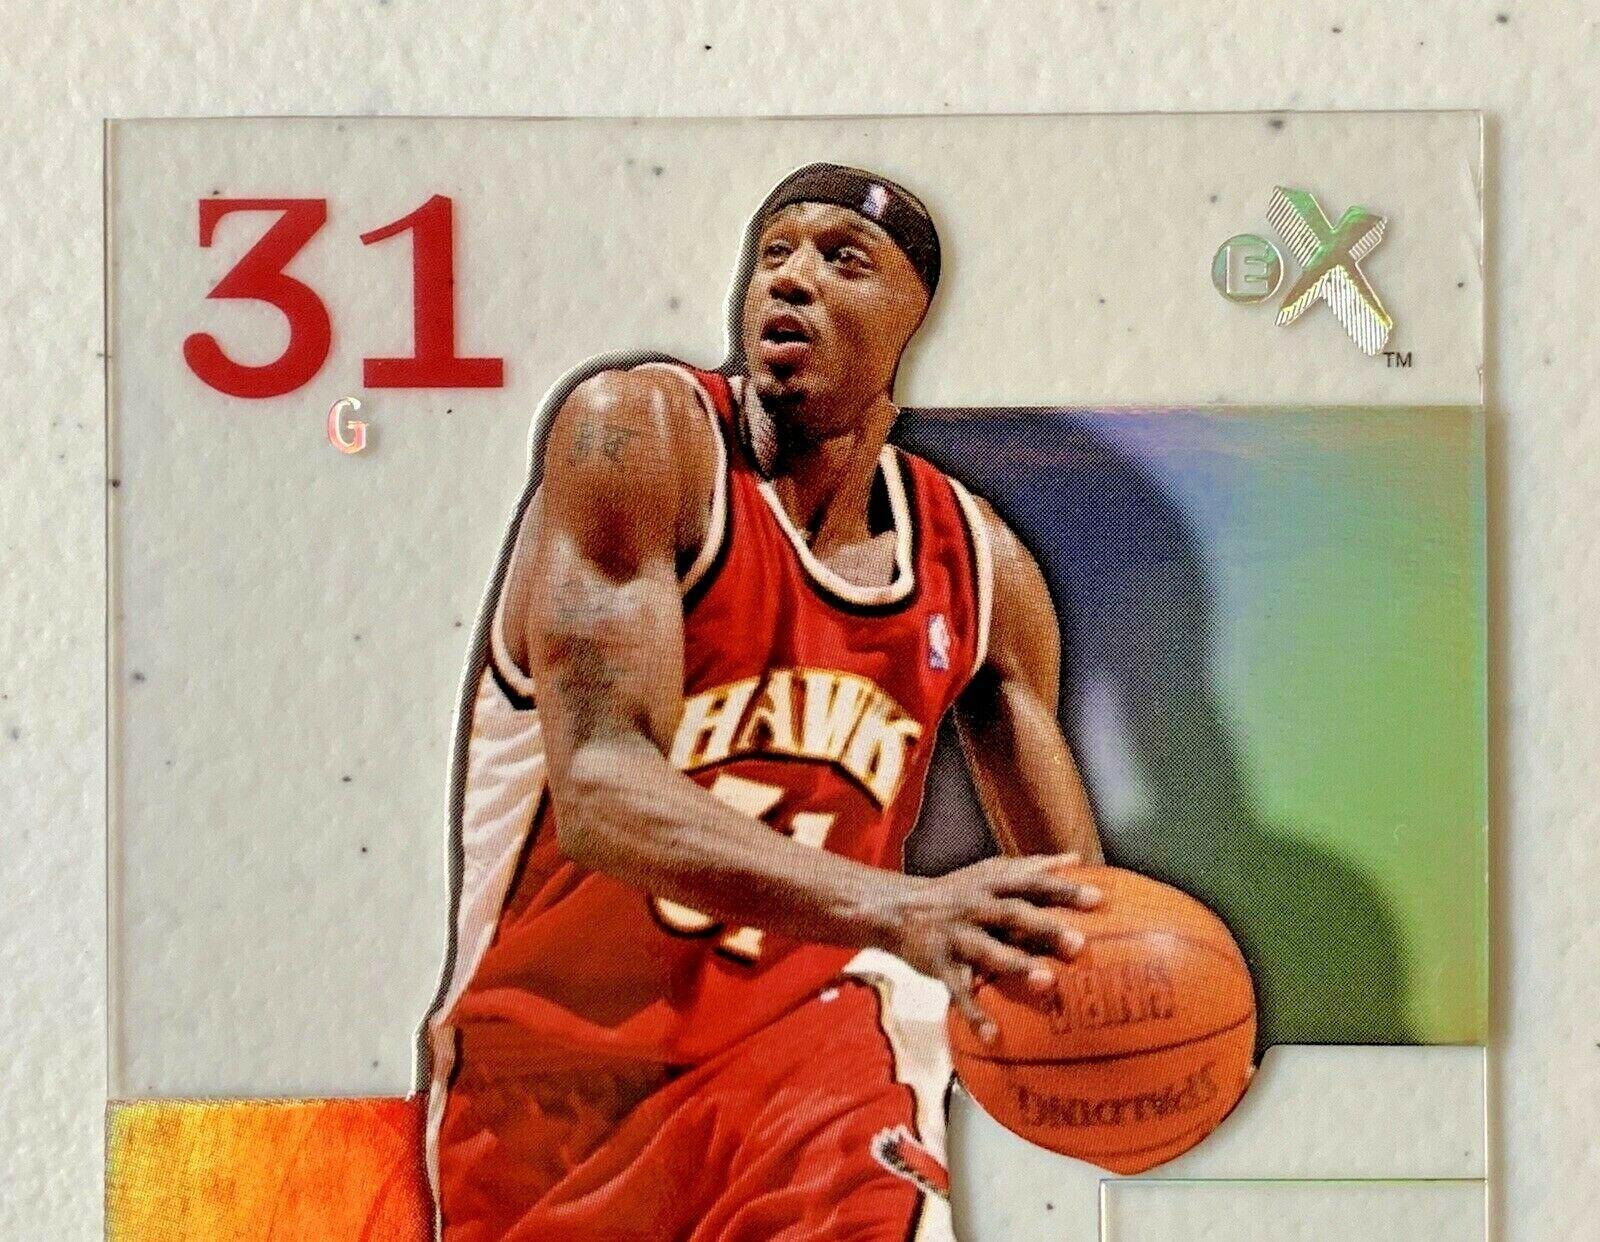 Jason Terry Now/66 #65 Atlanta Hawks Fleer Basketball Card with Hard Case 31G image 3